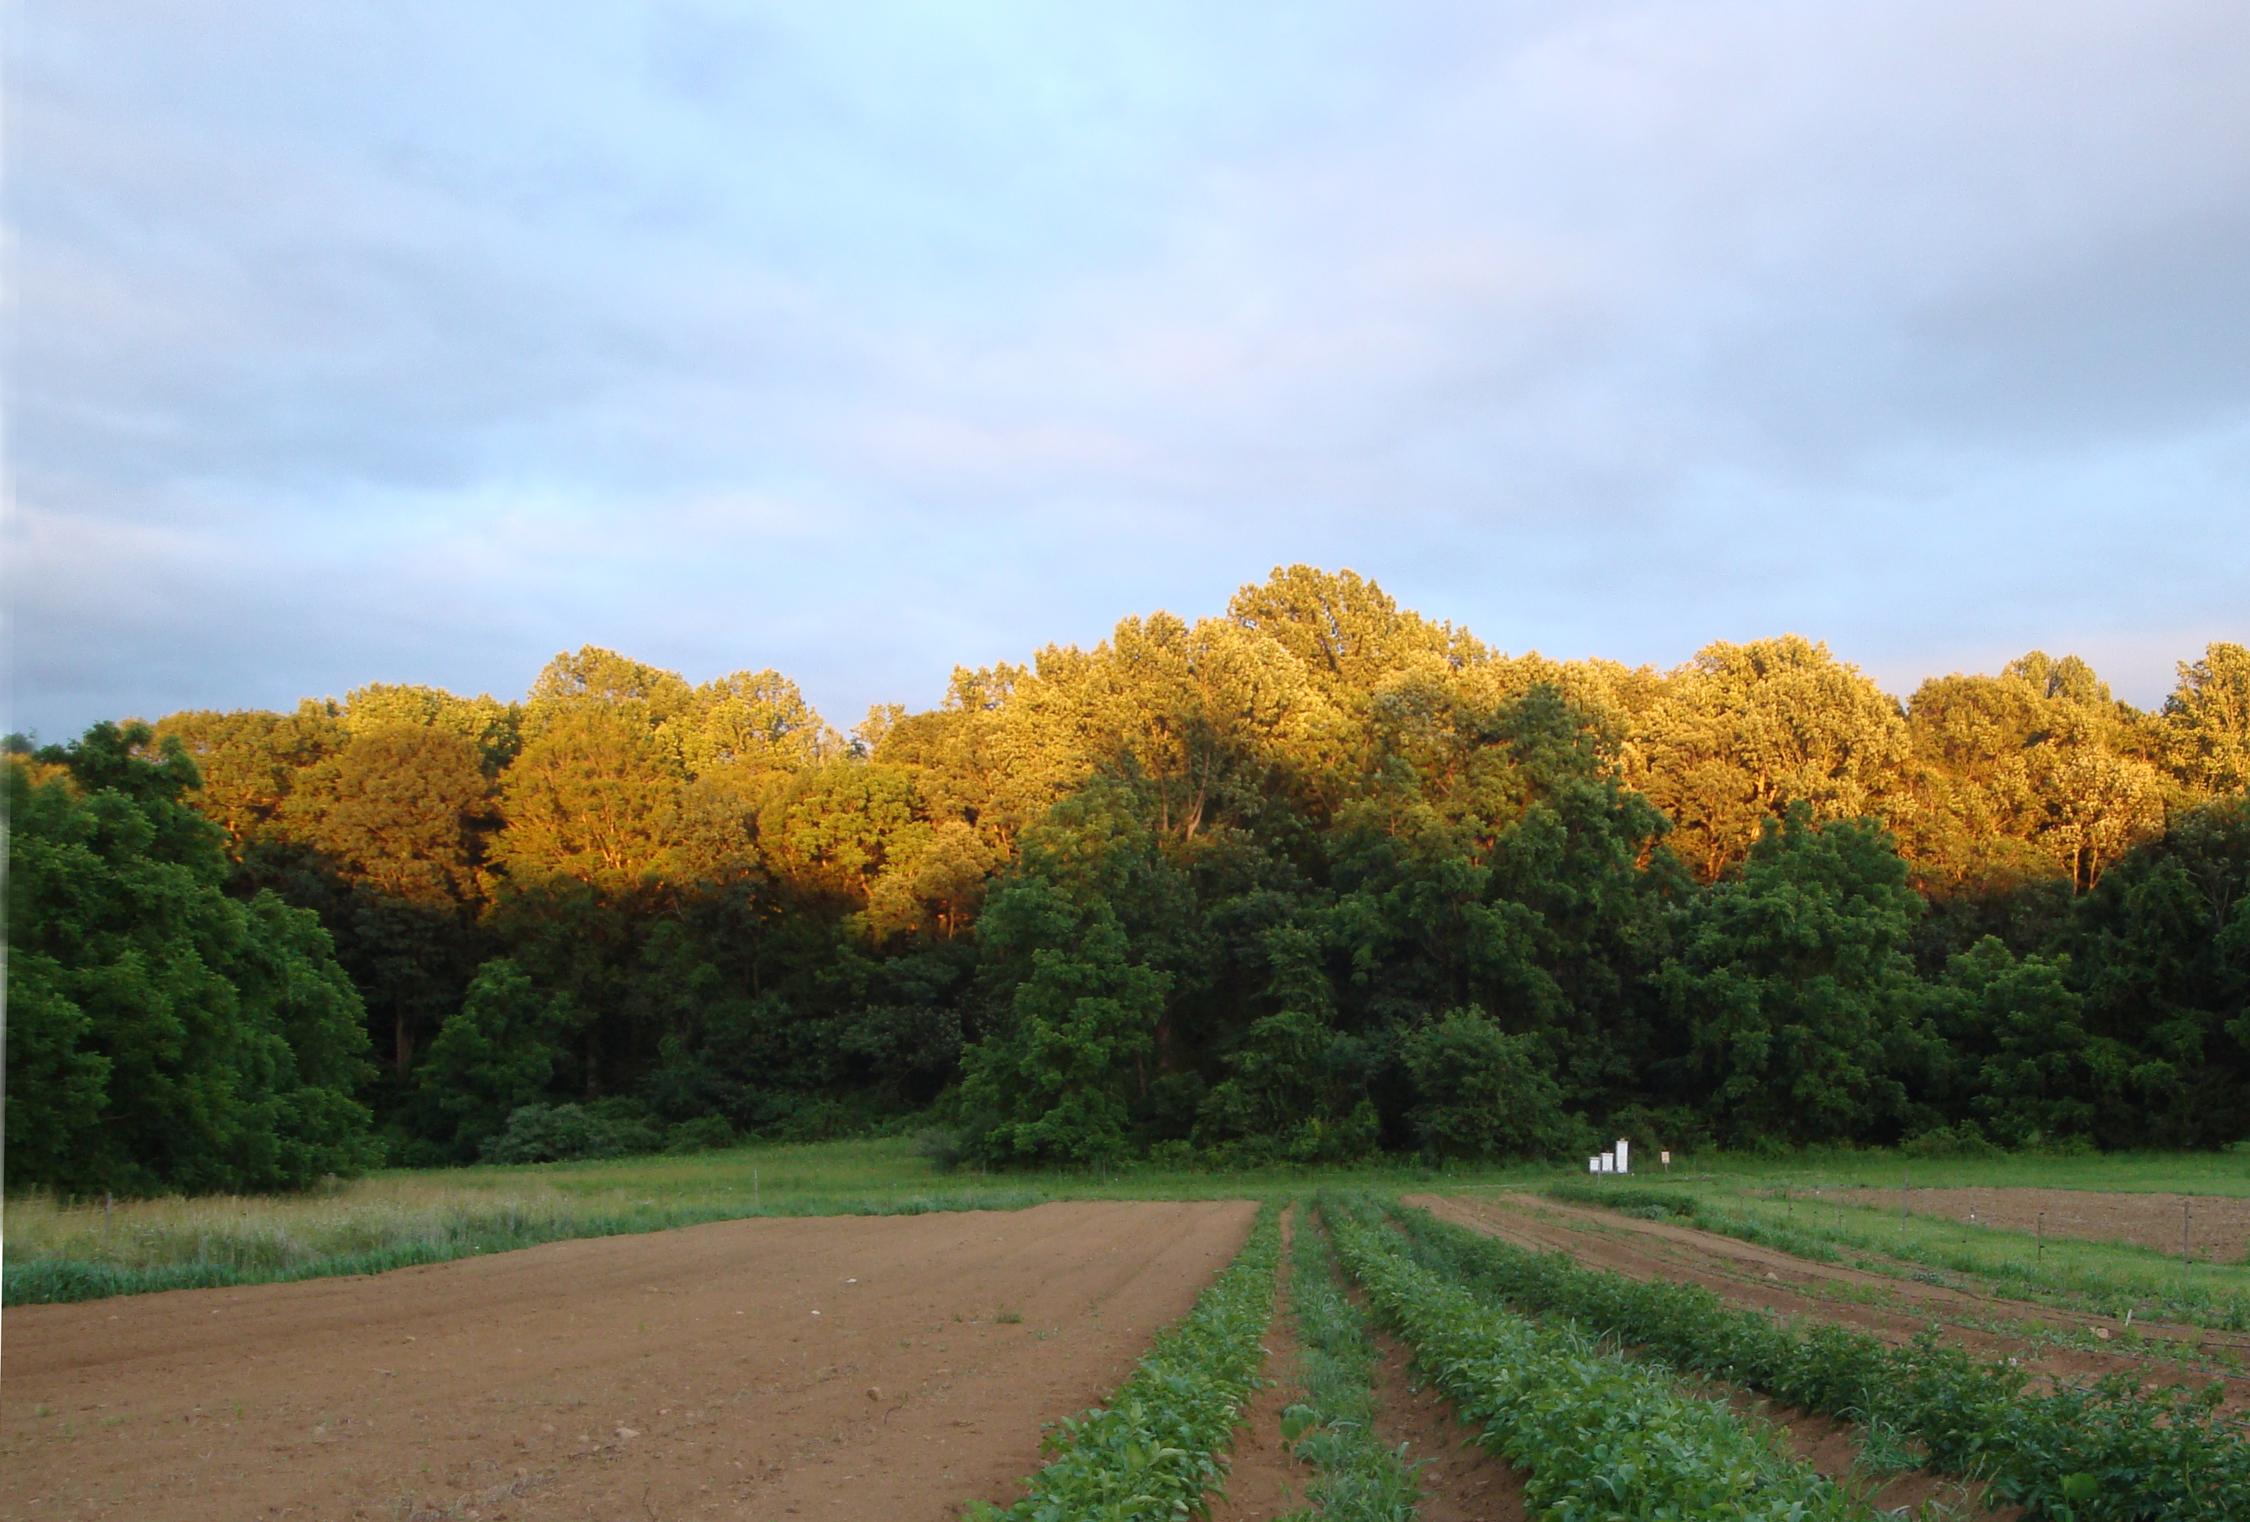 rushton-farm-golden-woods-iconic-image-6-16-10-jds-057